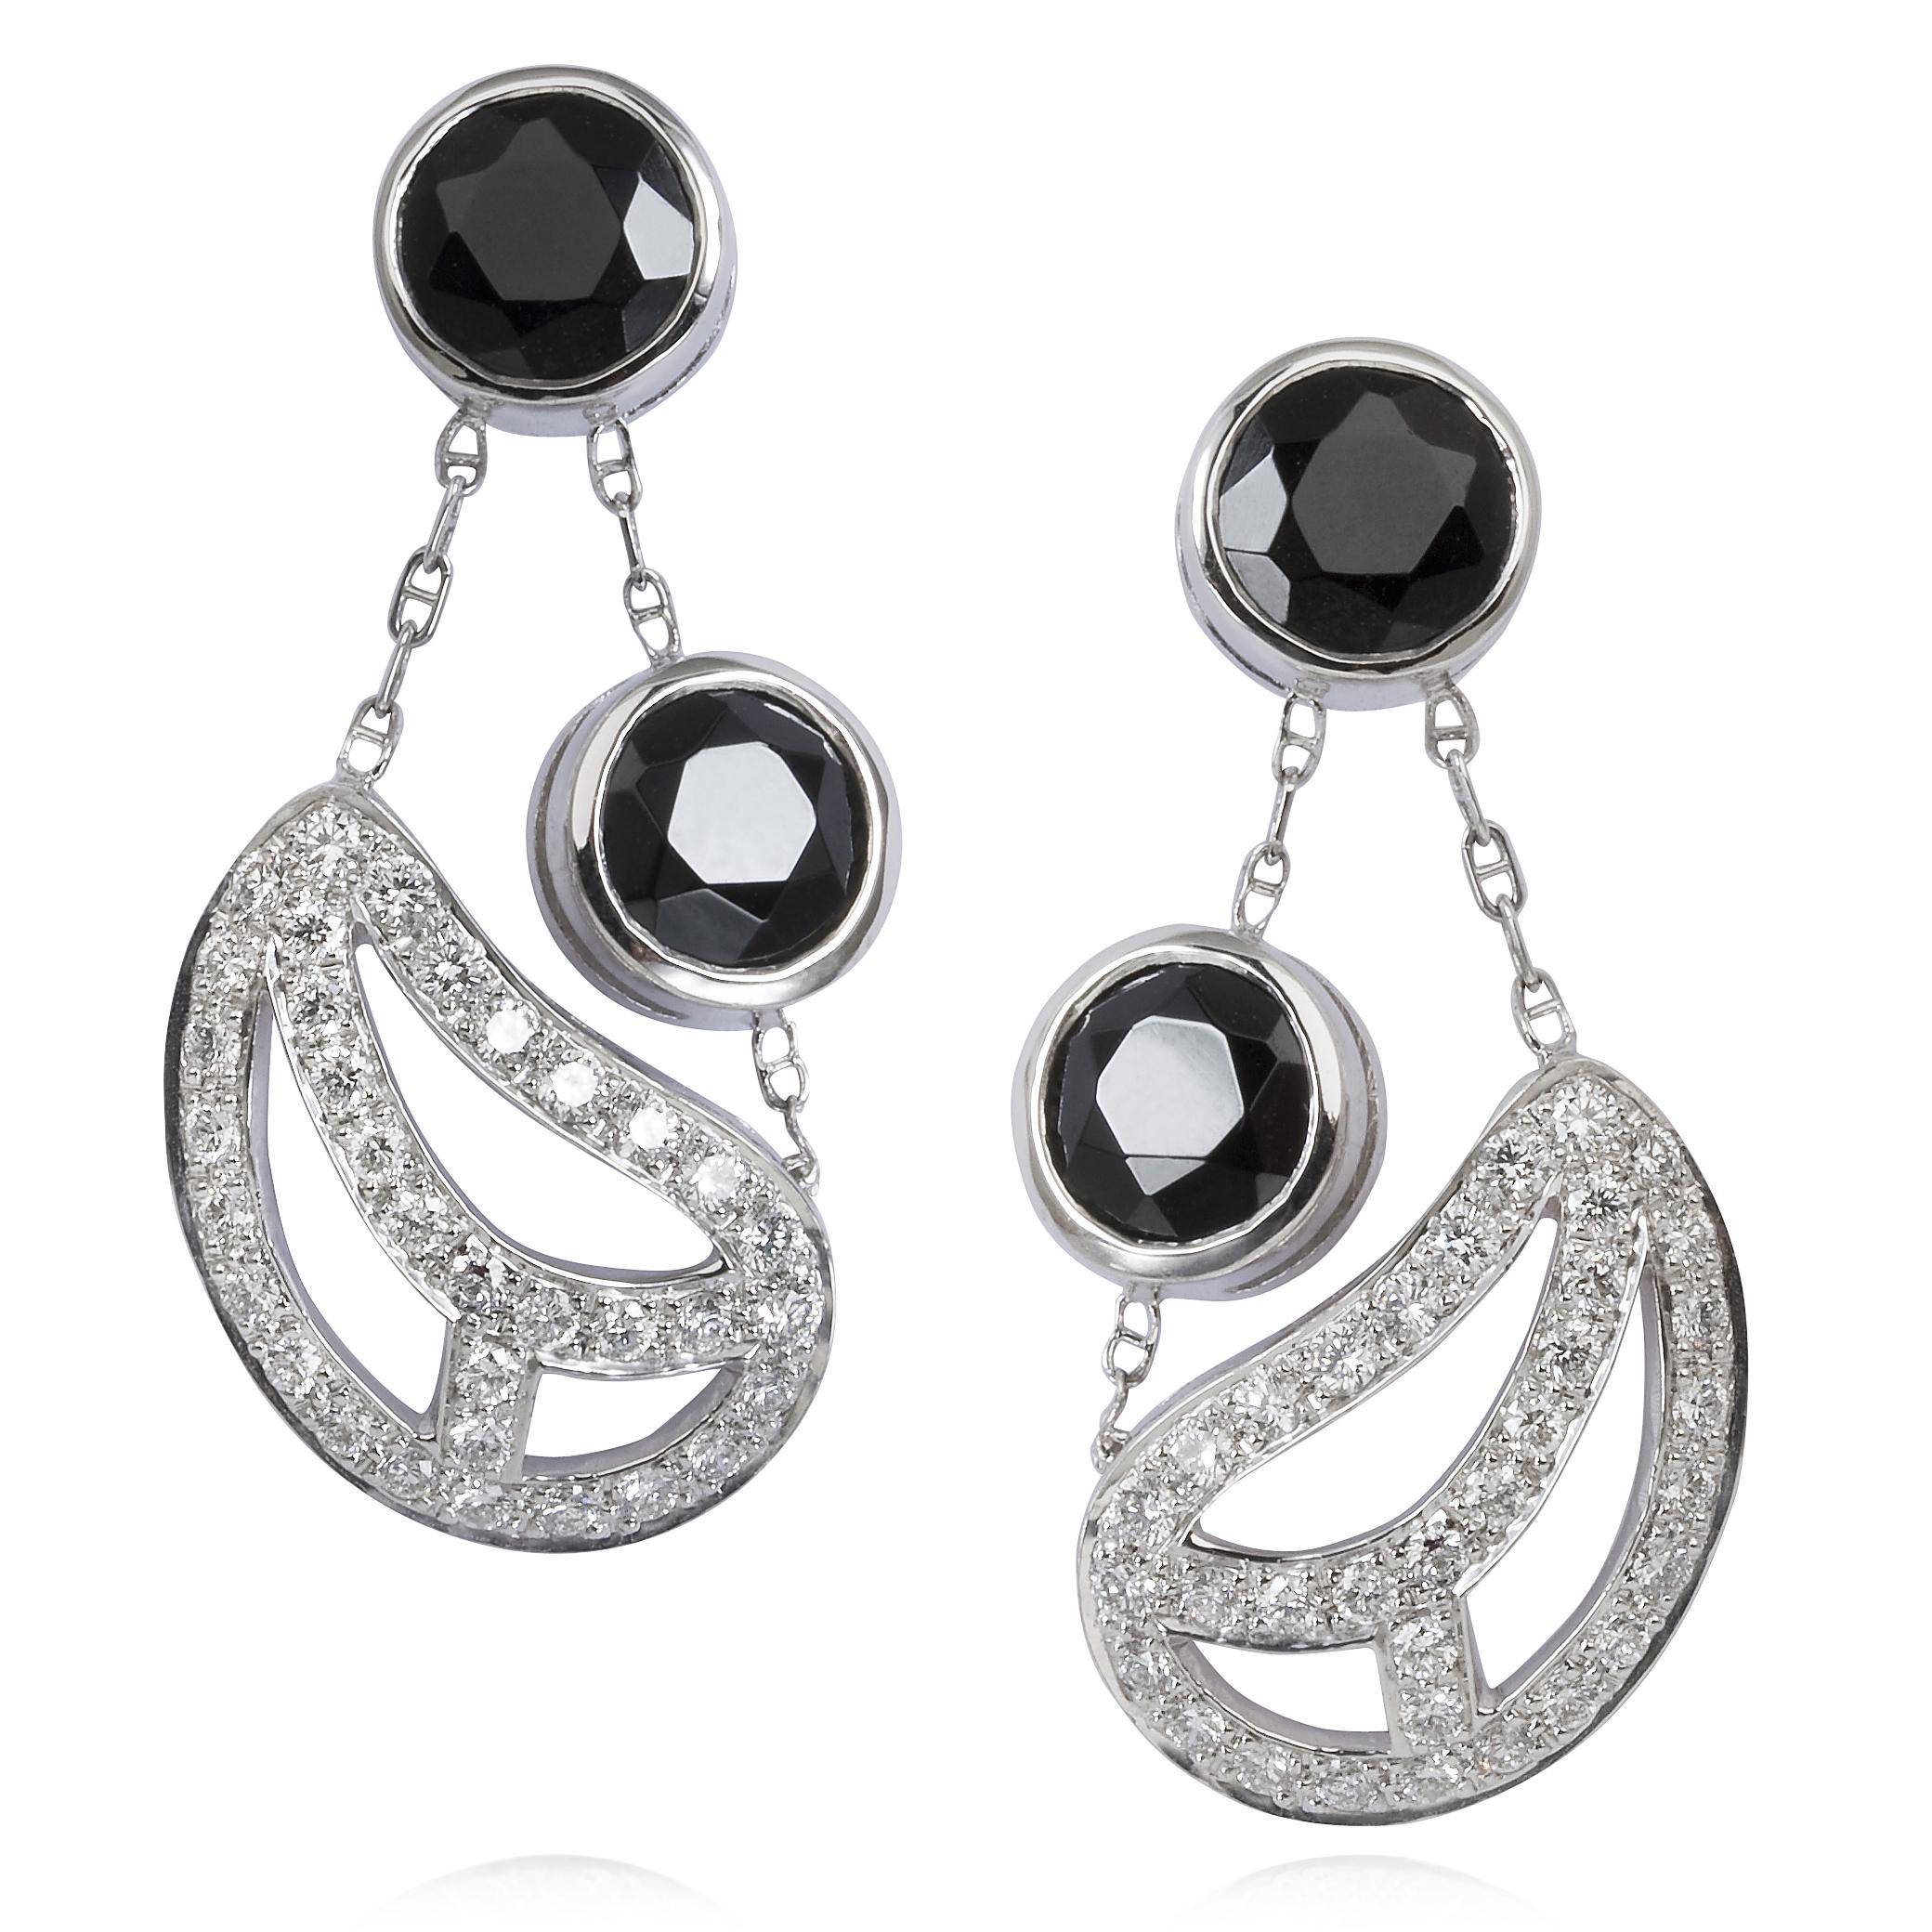 Diamond Leaf Earrings – Black Spinel And Diamonds In 18k White Gold